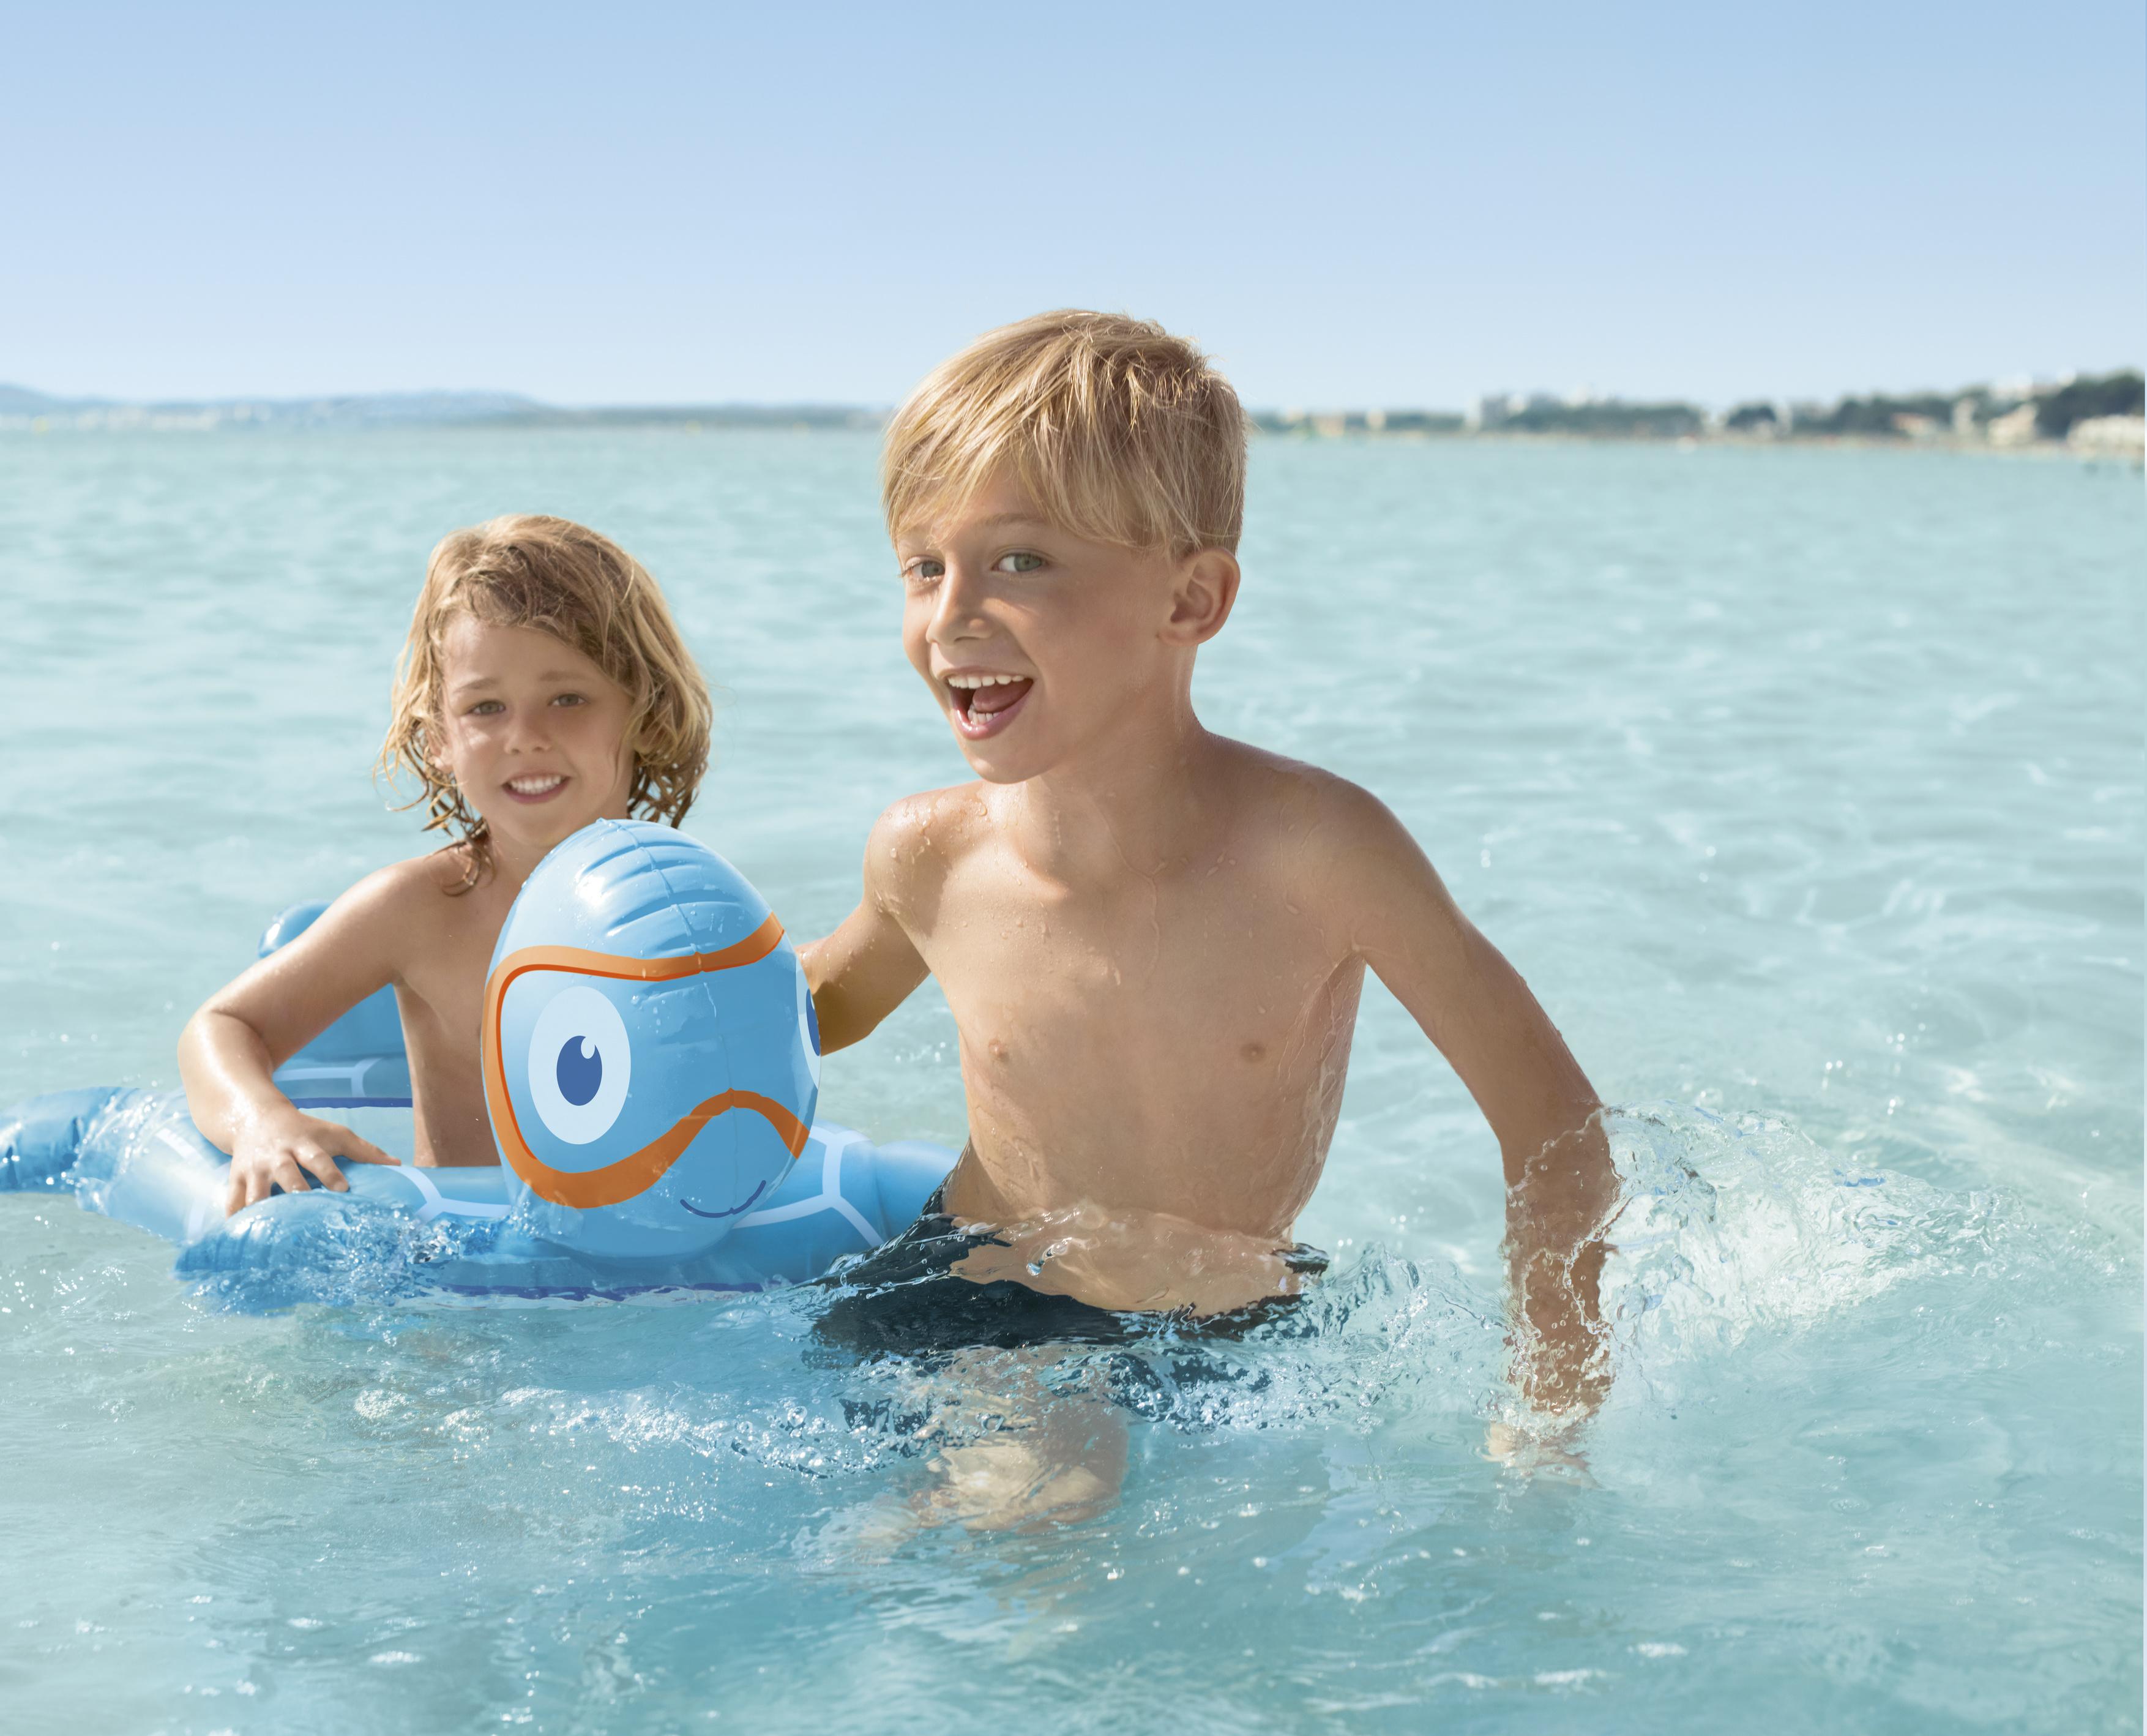 nsu_18606_kids_splash_pos_rgb_print_300_dpi.jpg